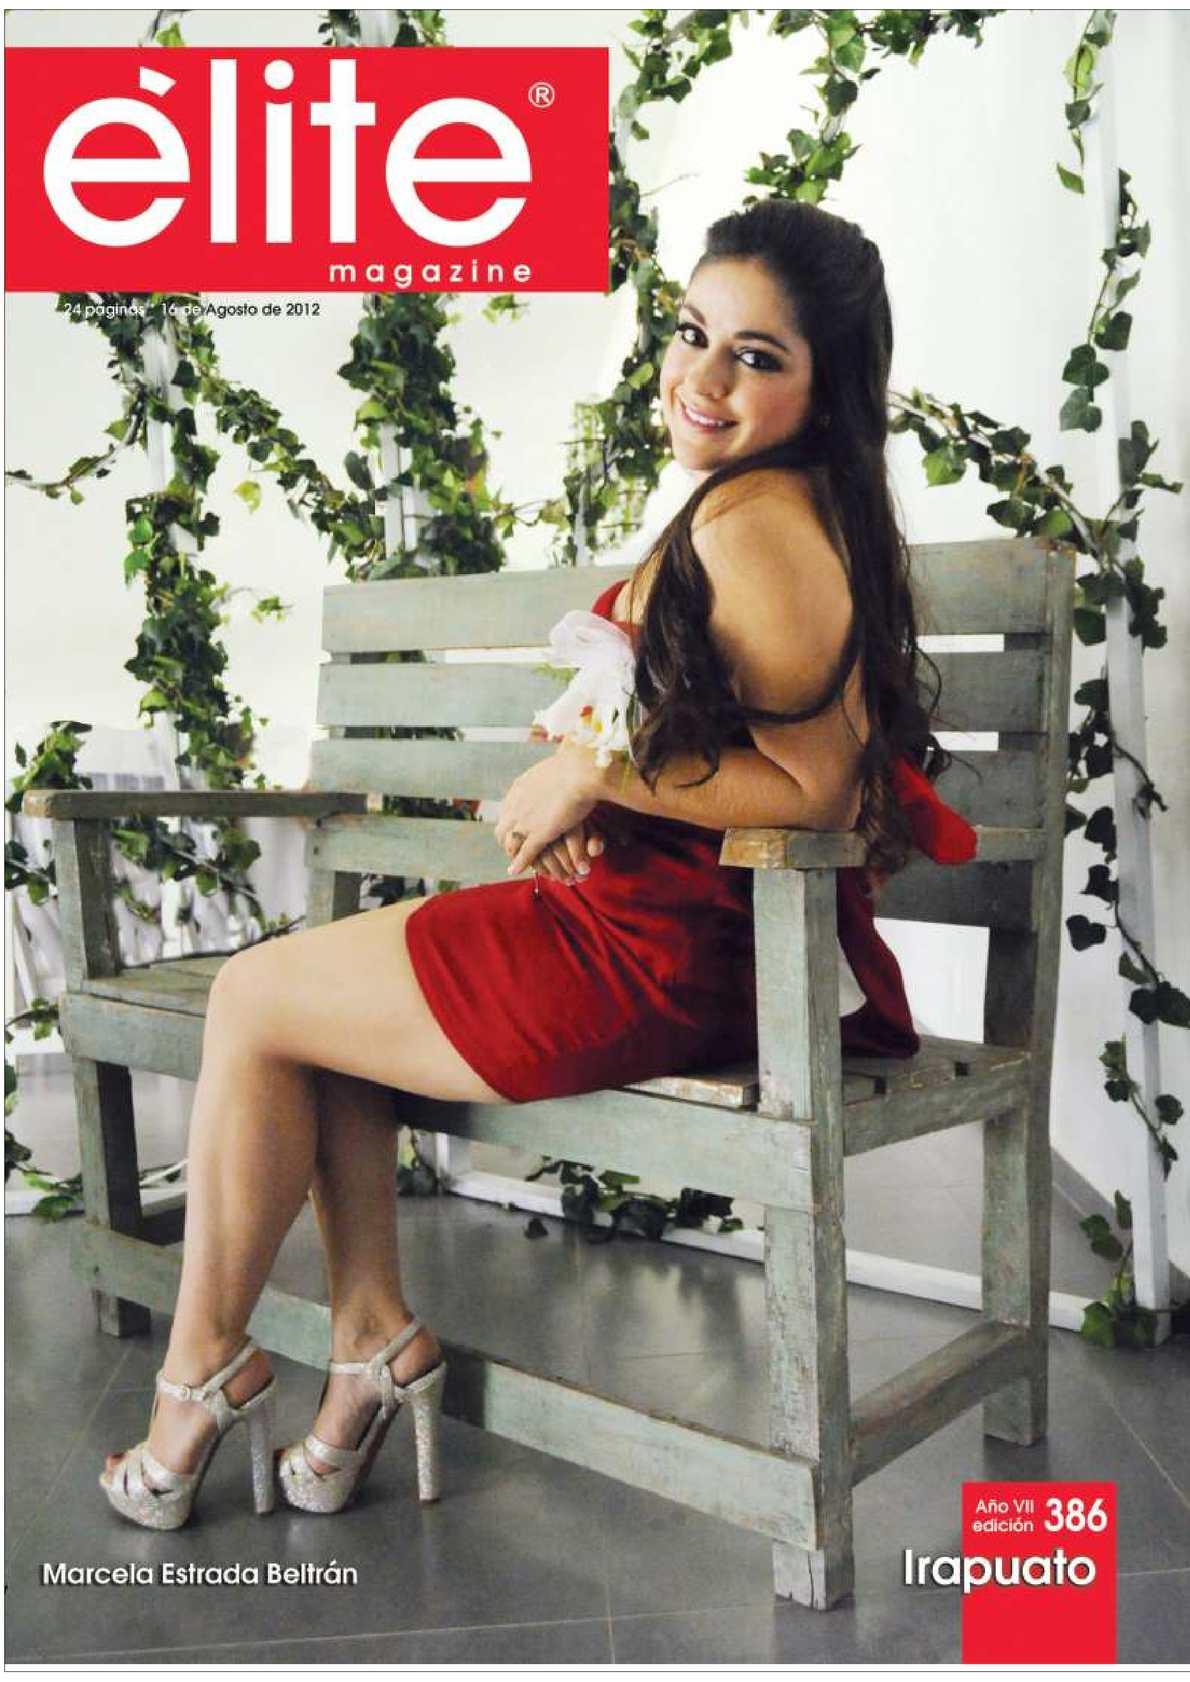 Élite Magazine Irapuato 386